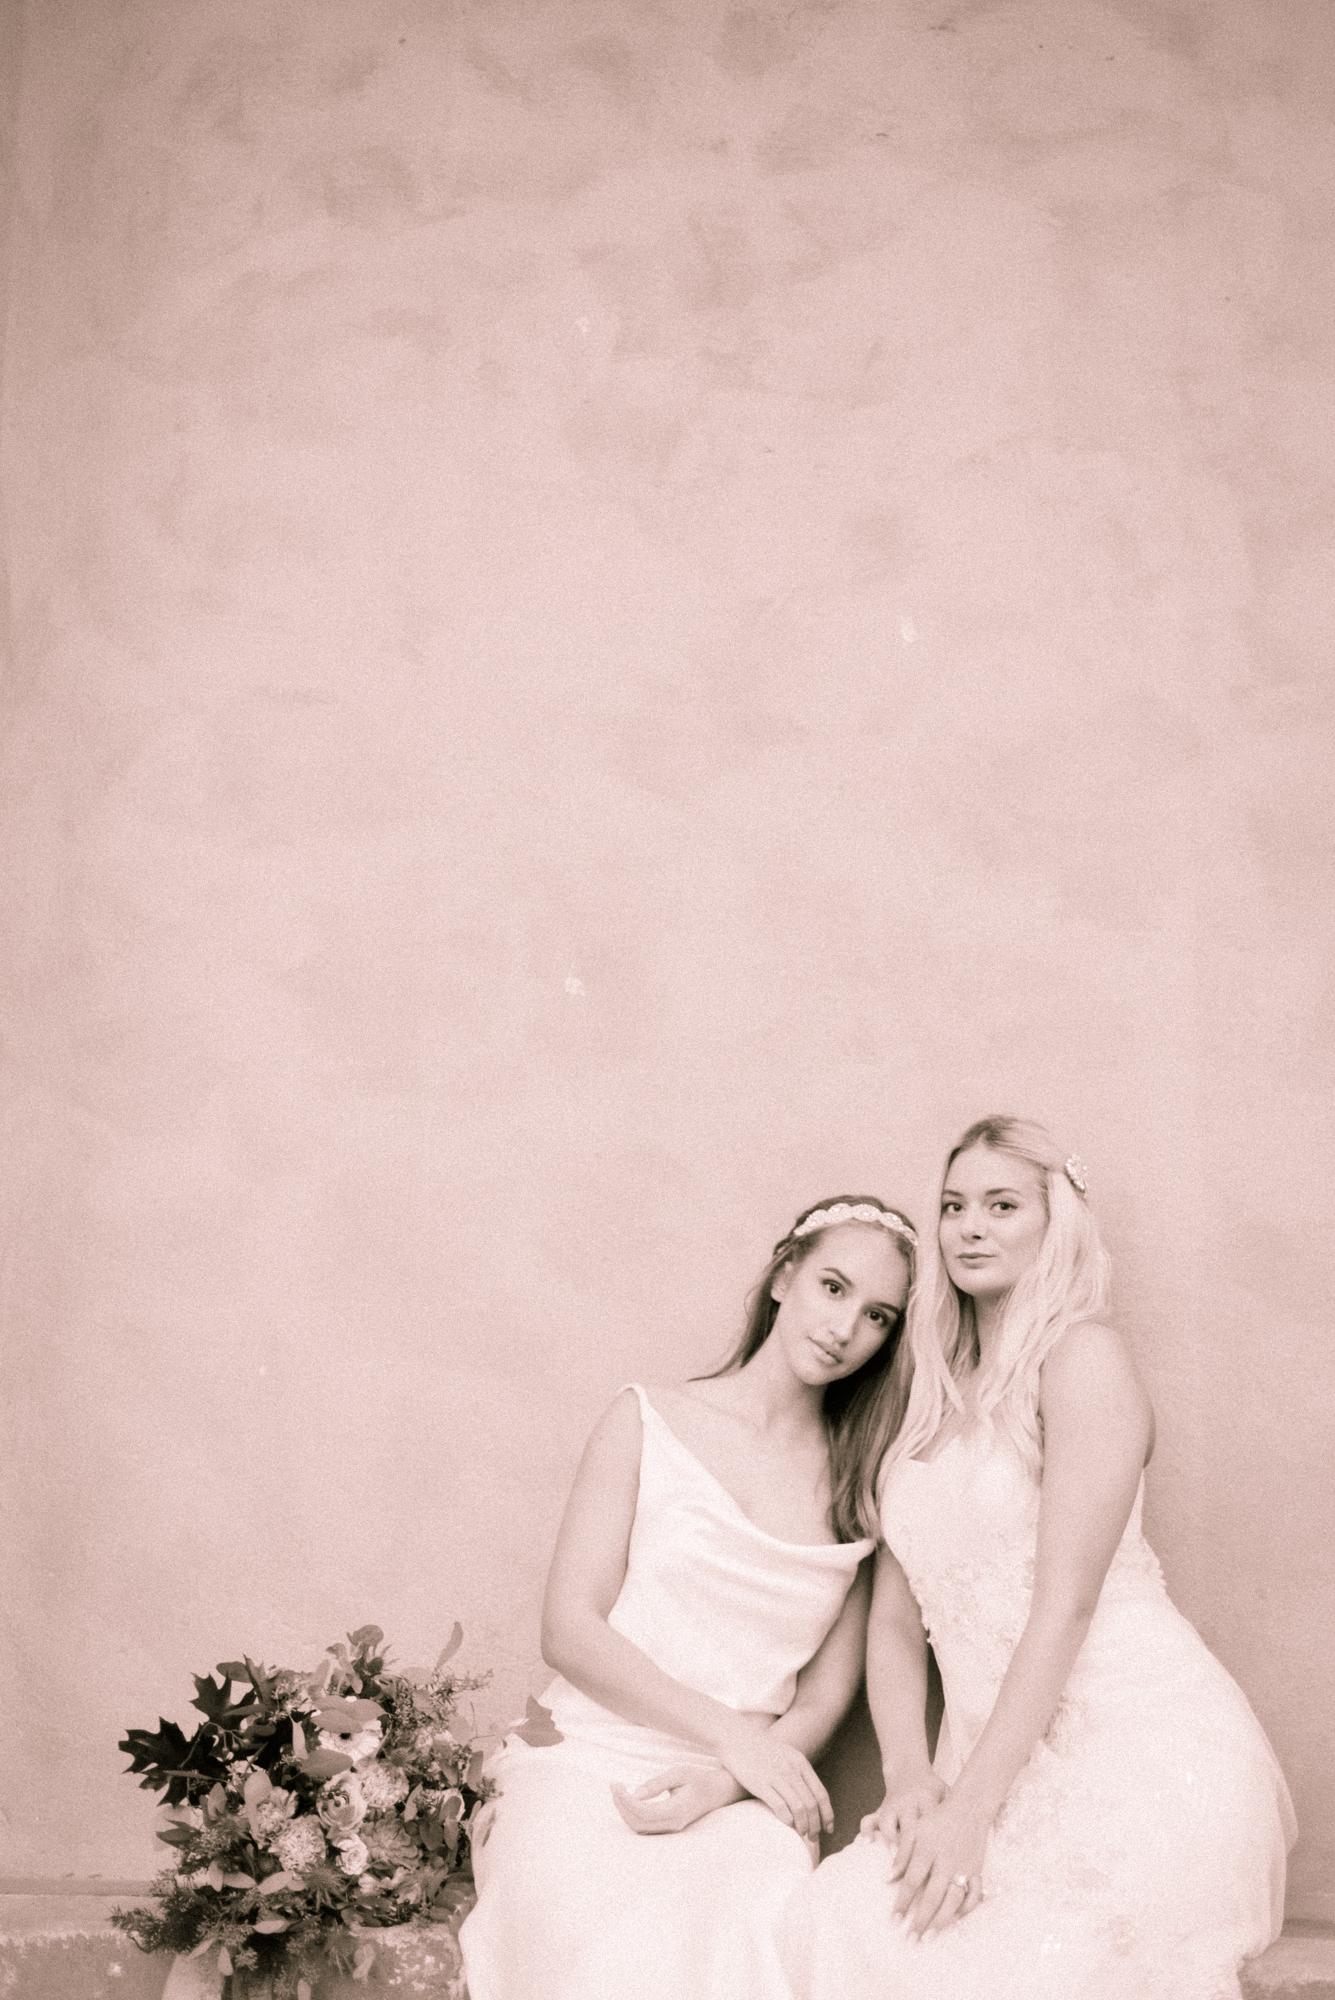 Elegant Organic Fall Swedish Bridal Wedding Styled Shoot - Erika Alvarenga Photography-149.jpg